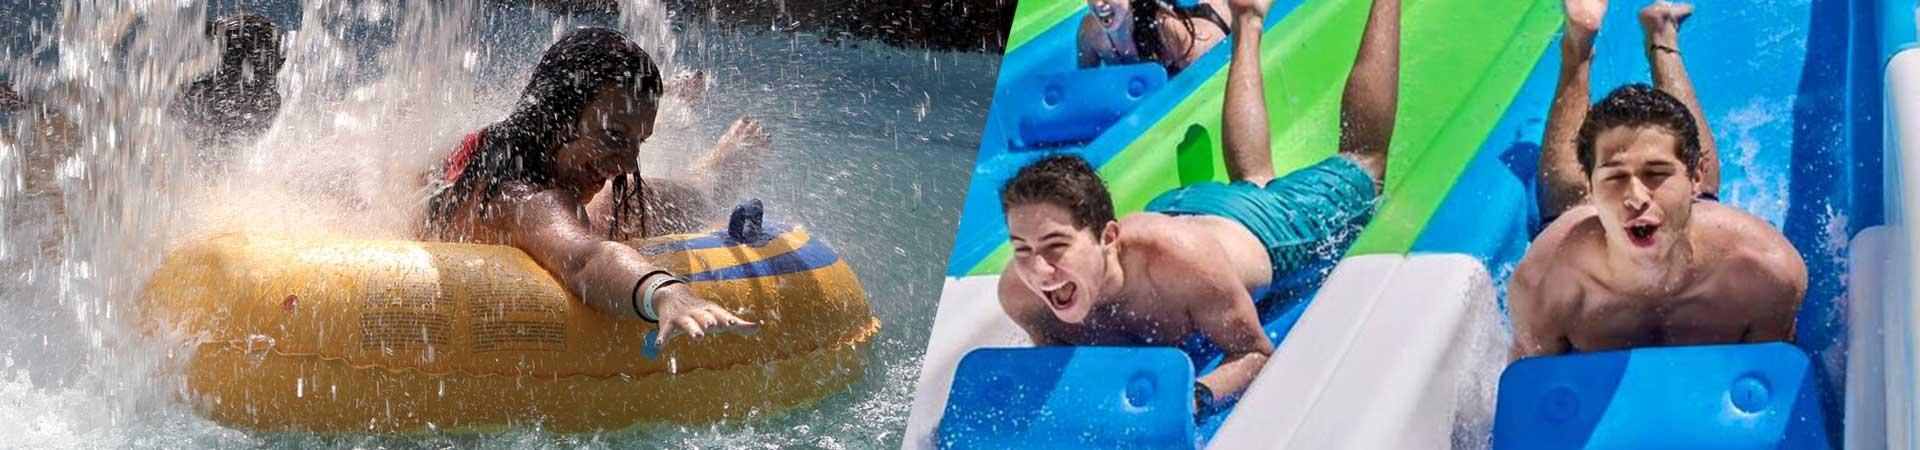 Waterpark slide mat